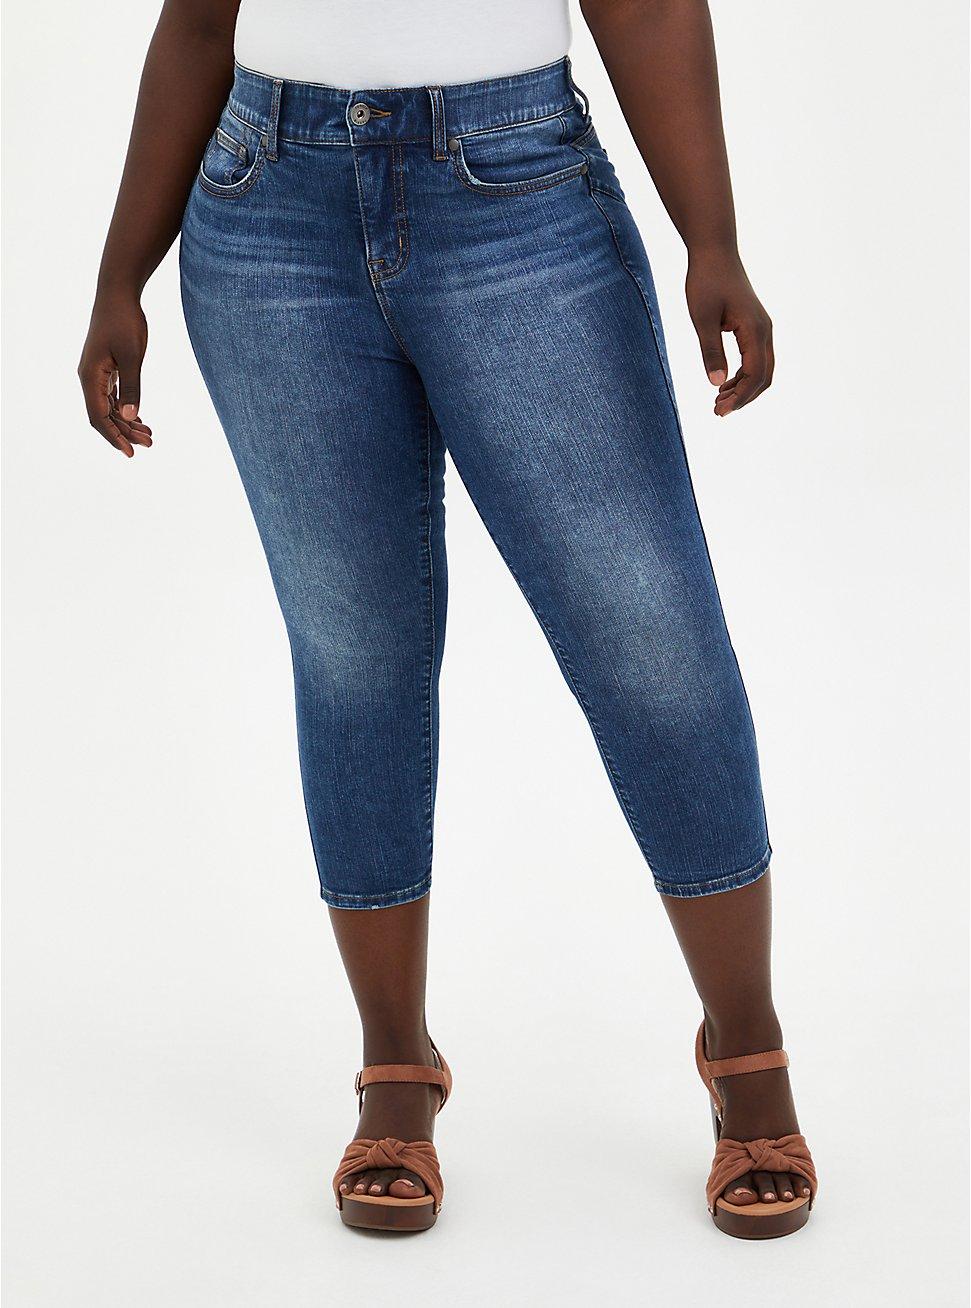 Crop Bombshell Skinny Jean - Premium Stretch Medium Wash, , fitModel1-hires